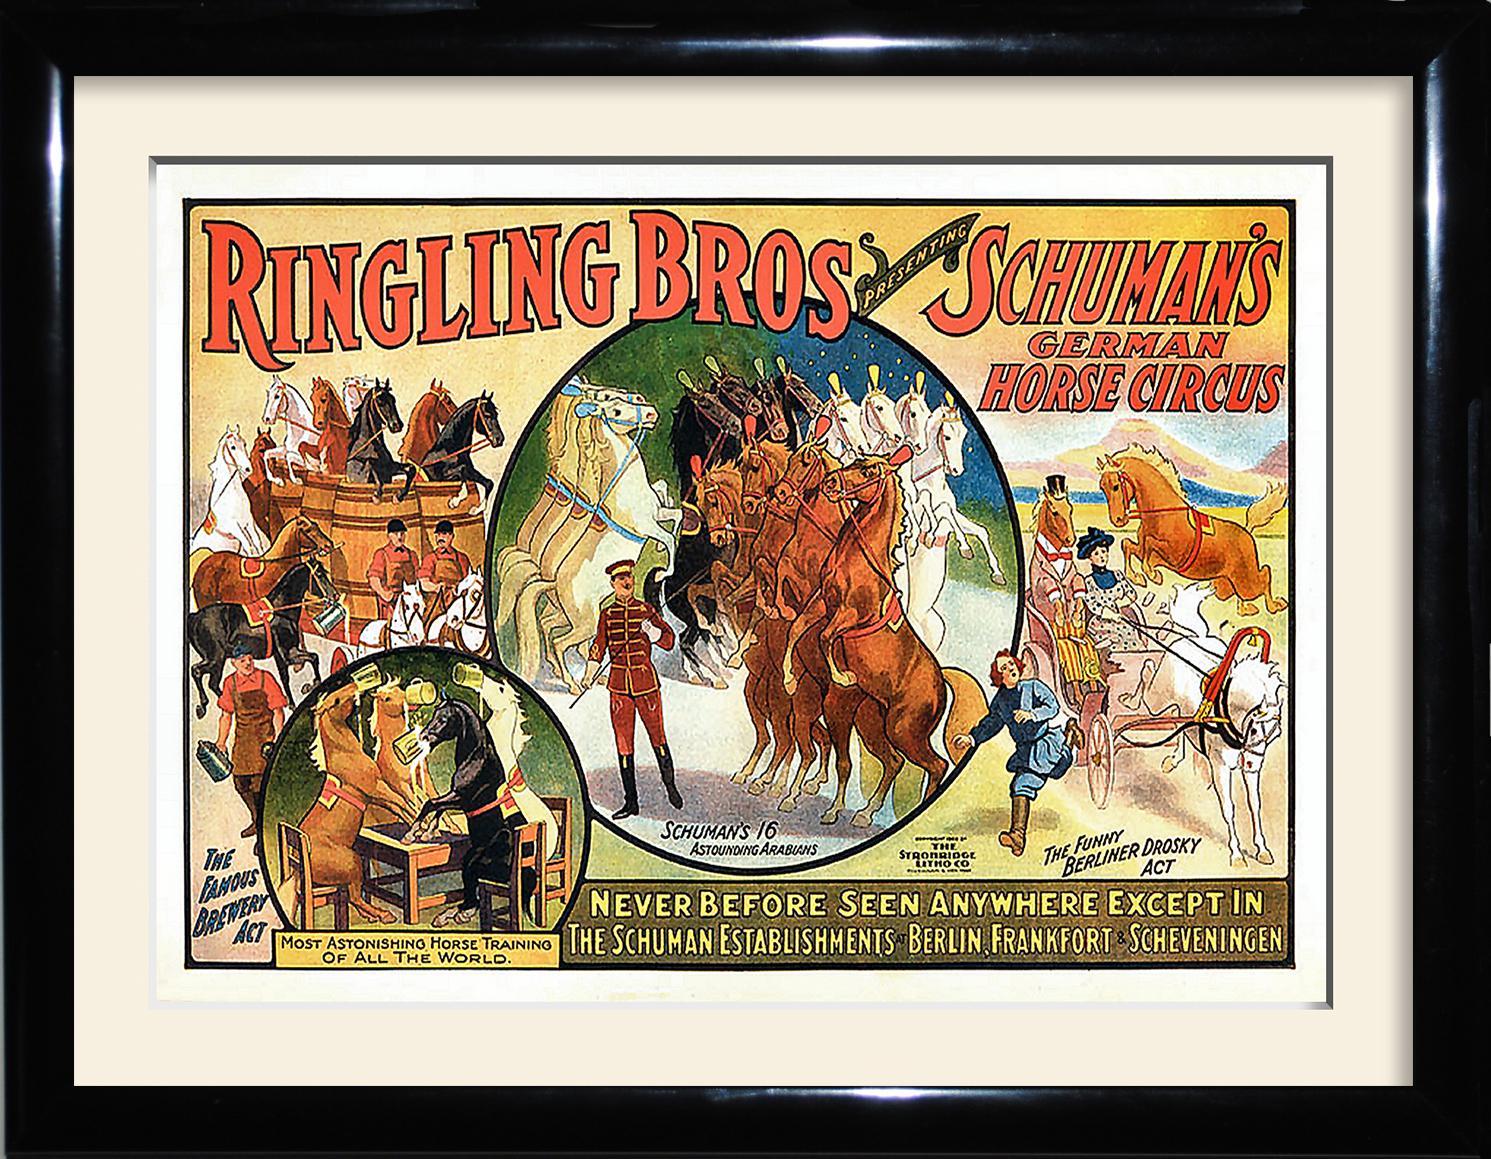 German horse circus